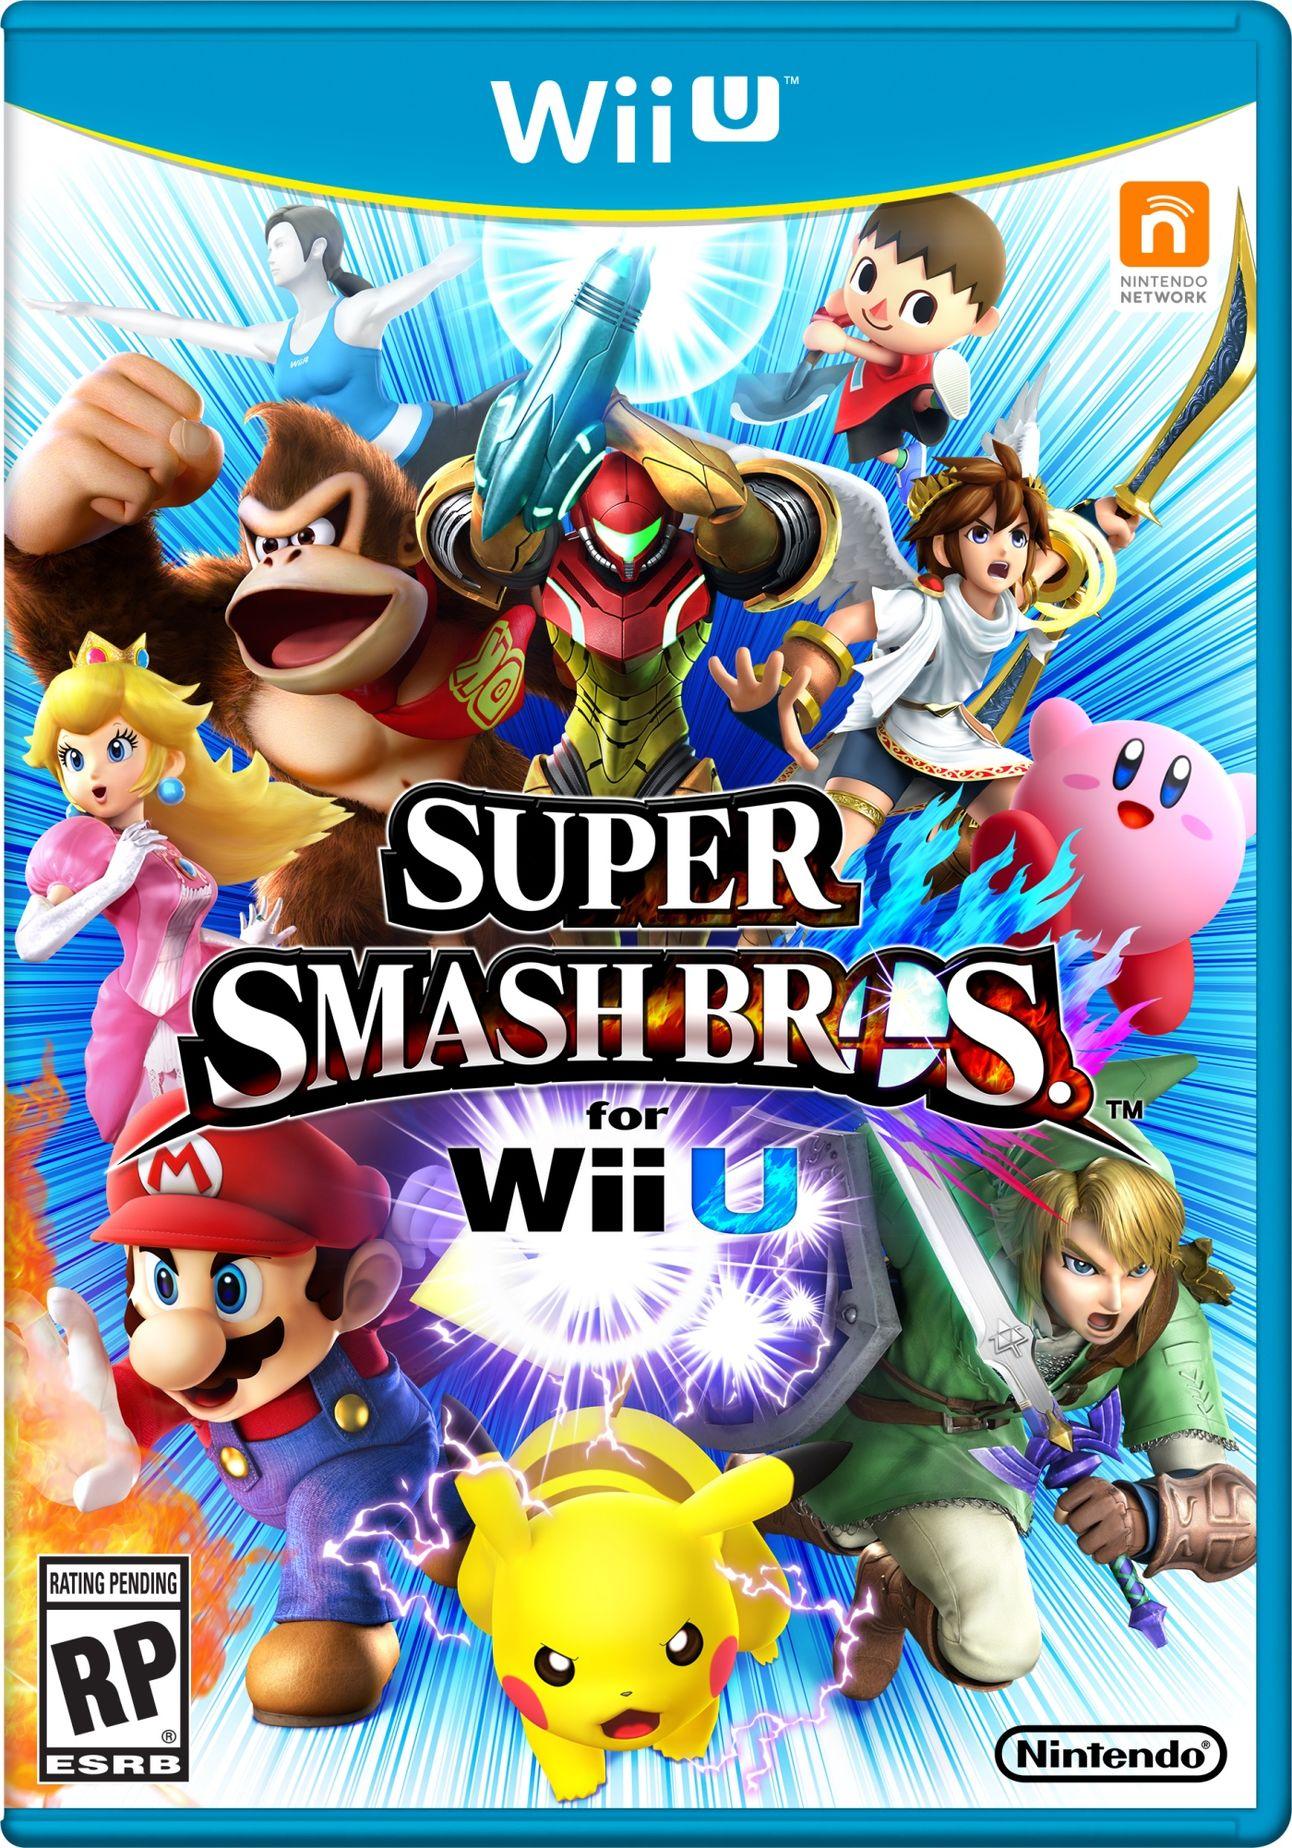 WiiU_SuperSmashBros_pkg.jpg